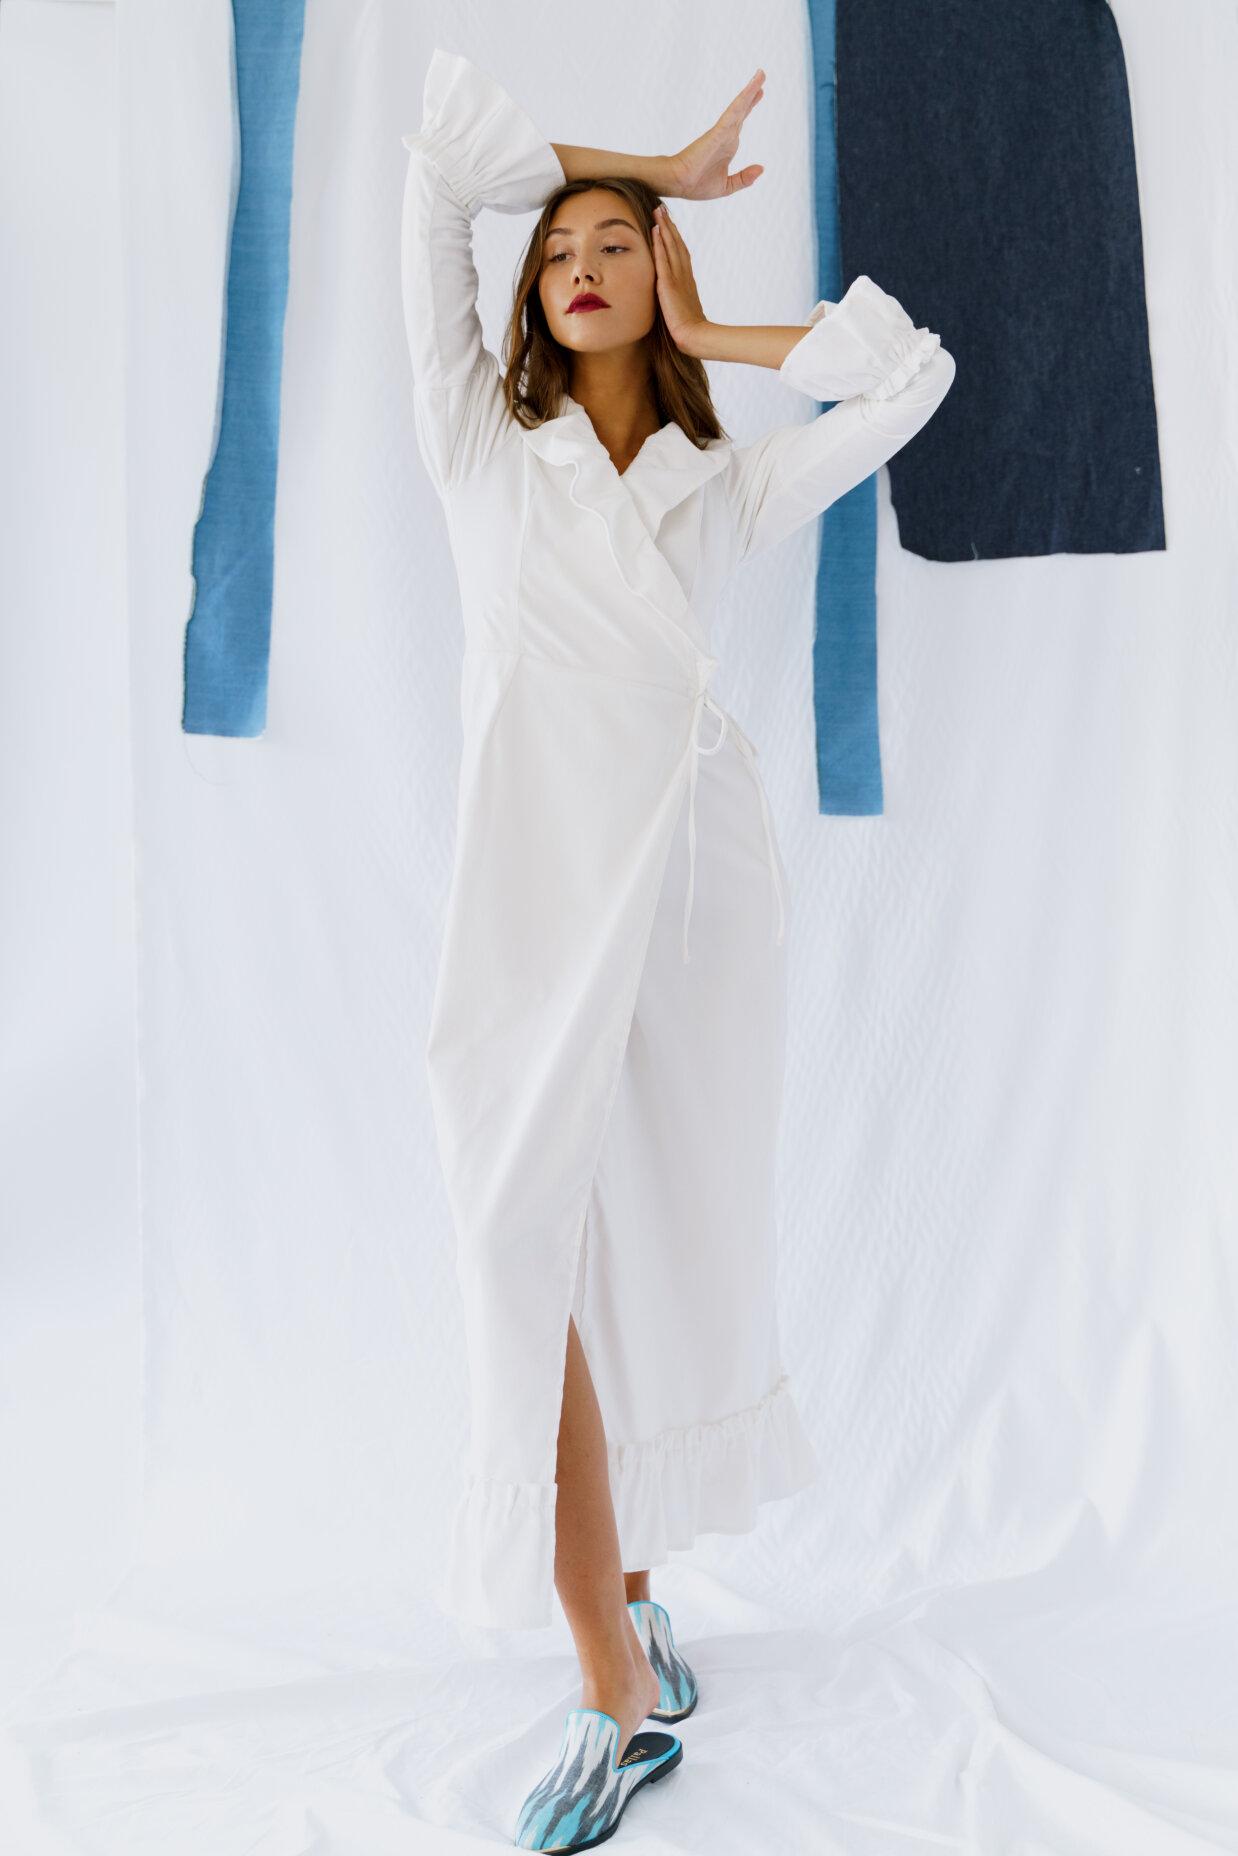 CHENEGA DRESS - SIZ BRAND